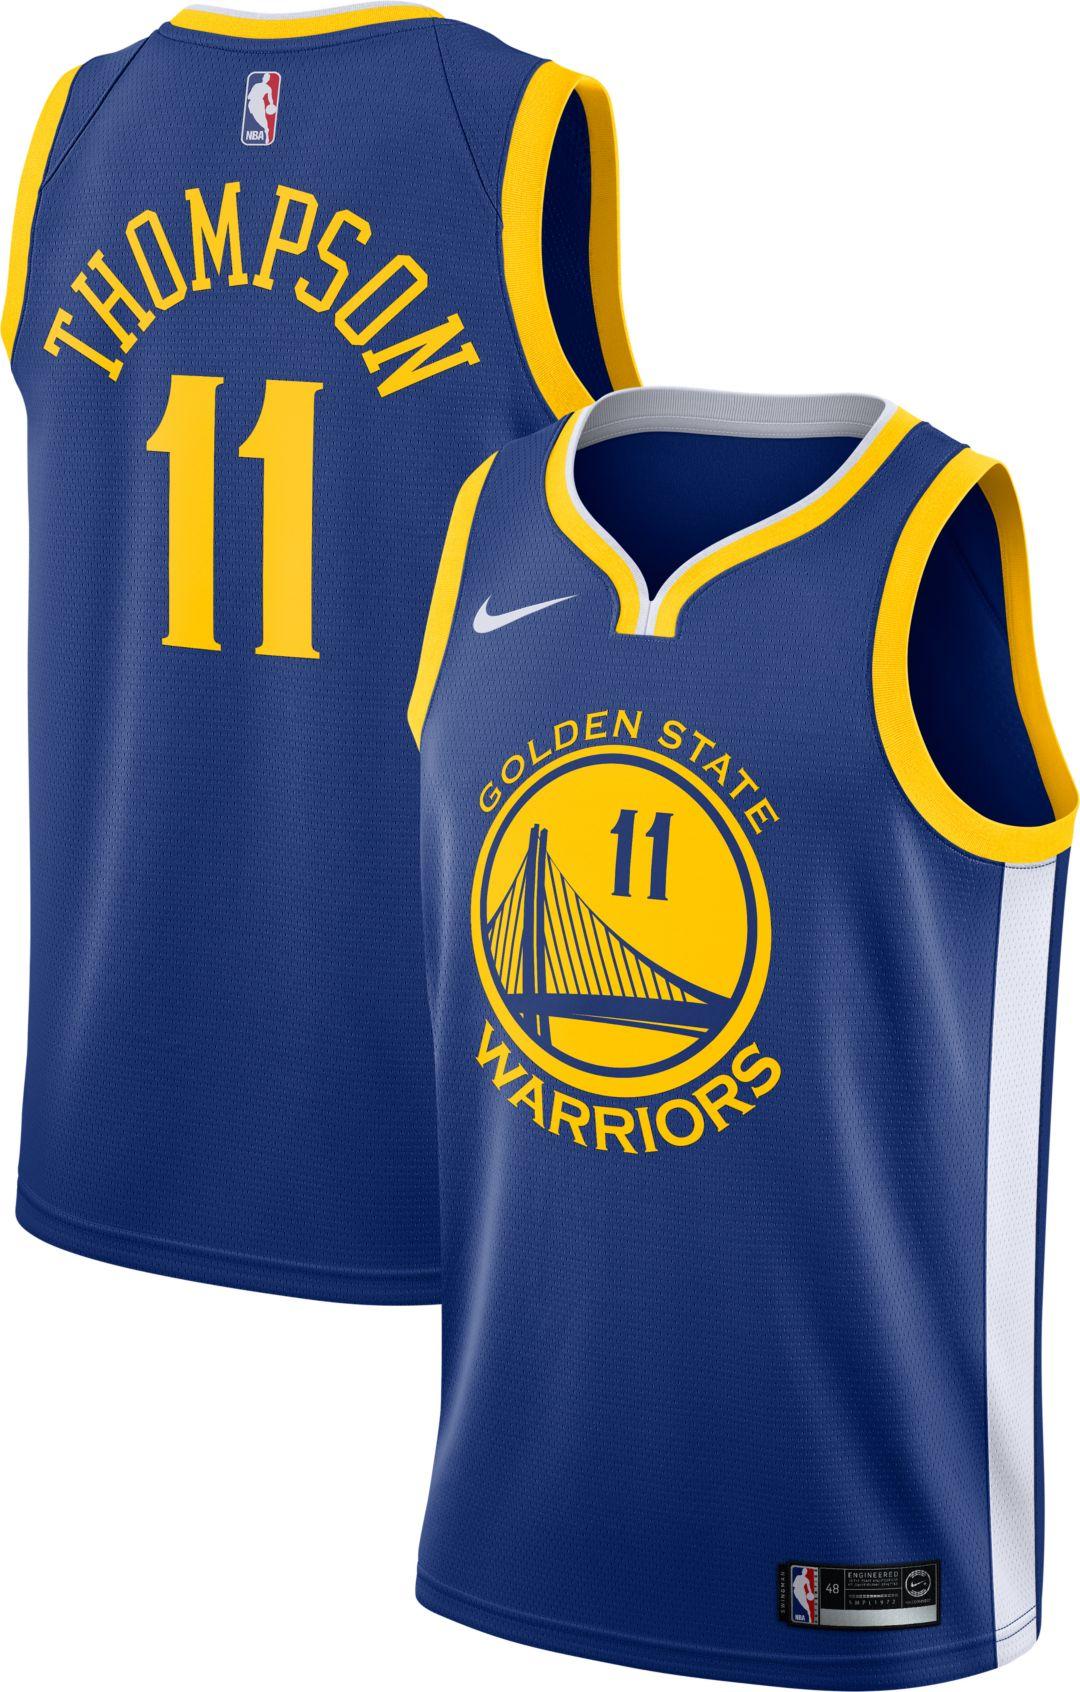 best cheap 63ed2 fe98c Nike Men's Golden State Warriors Klay Thompson #11 Royal Dri-FIT Swingman  Jersey